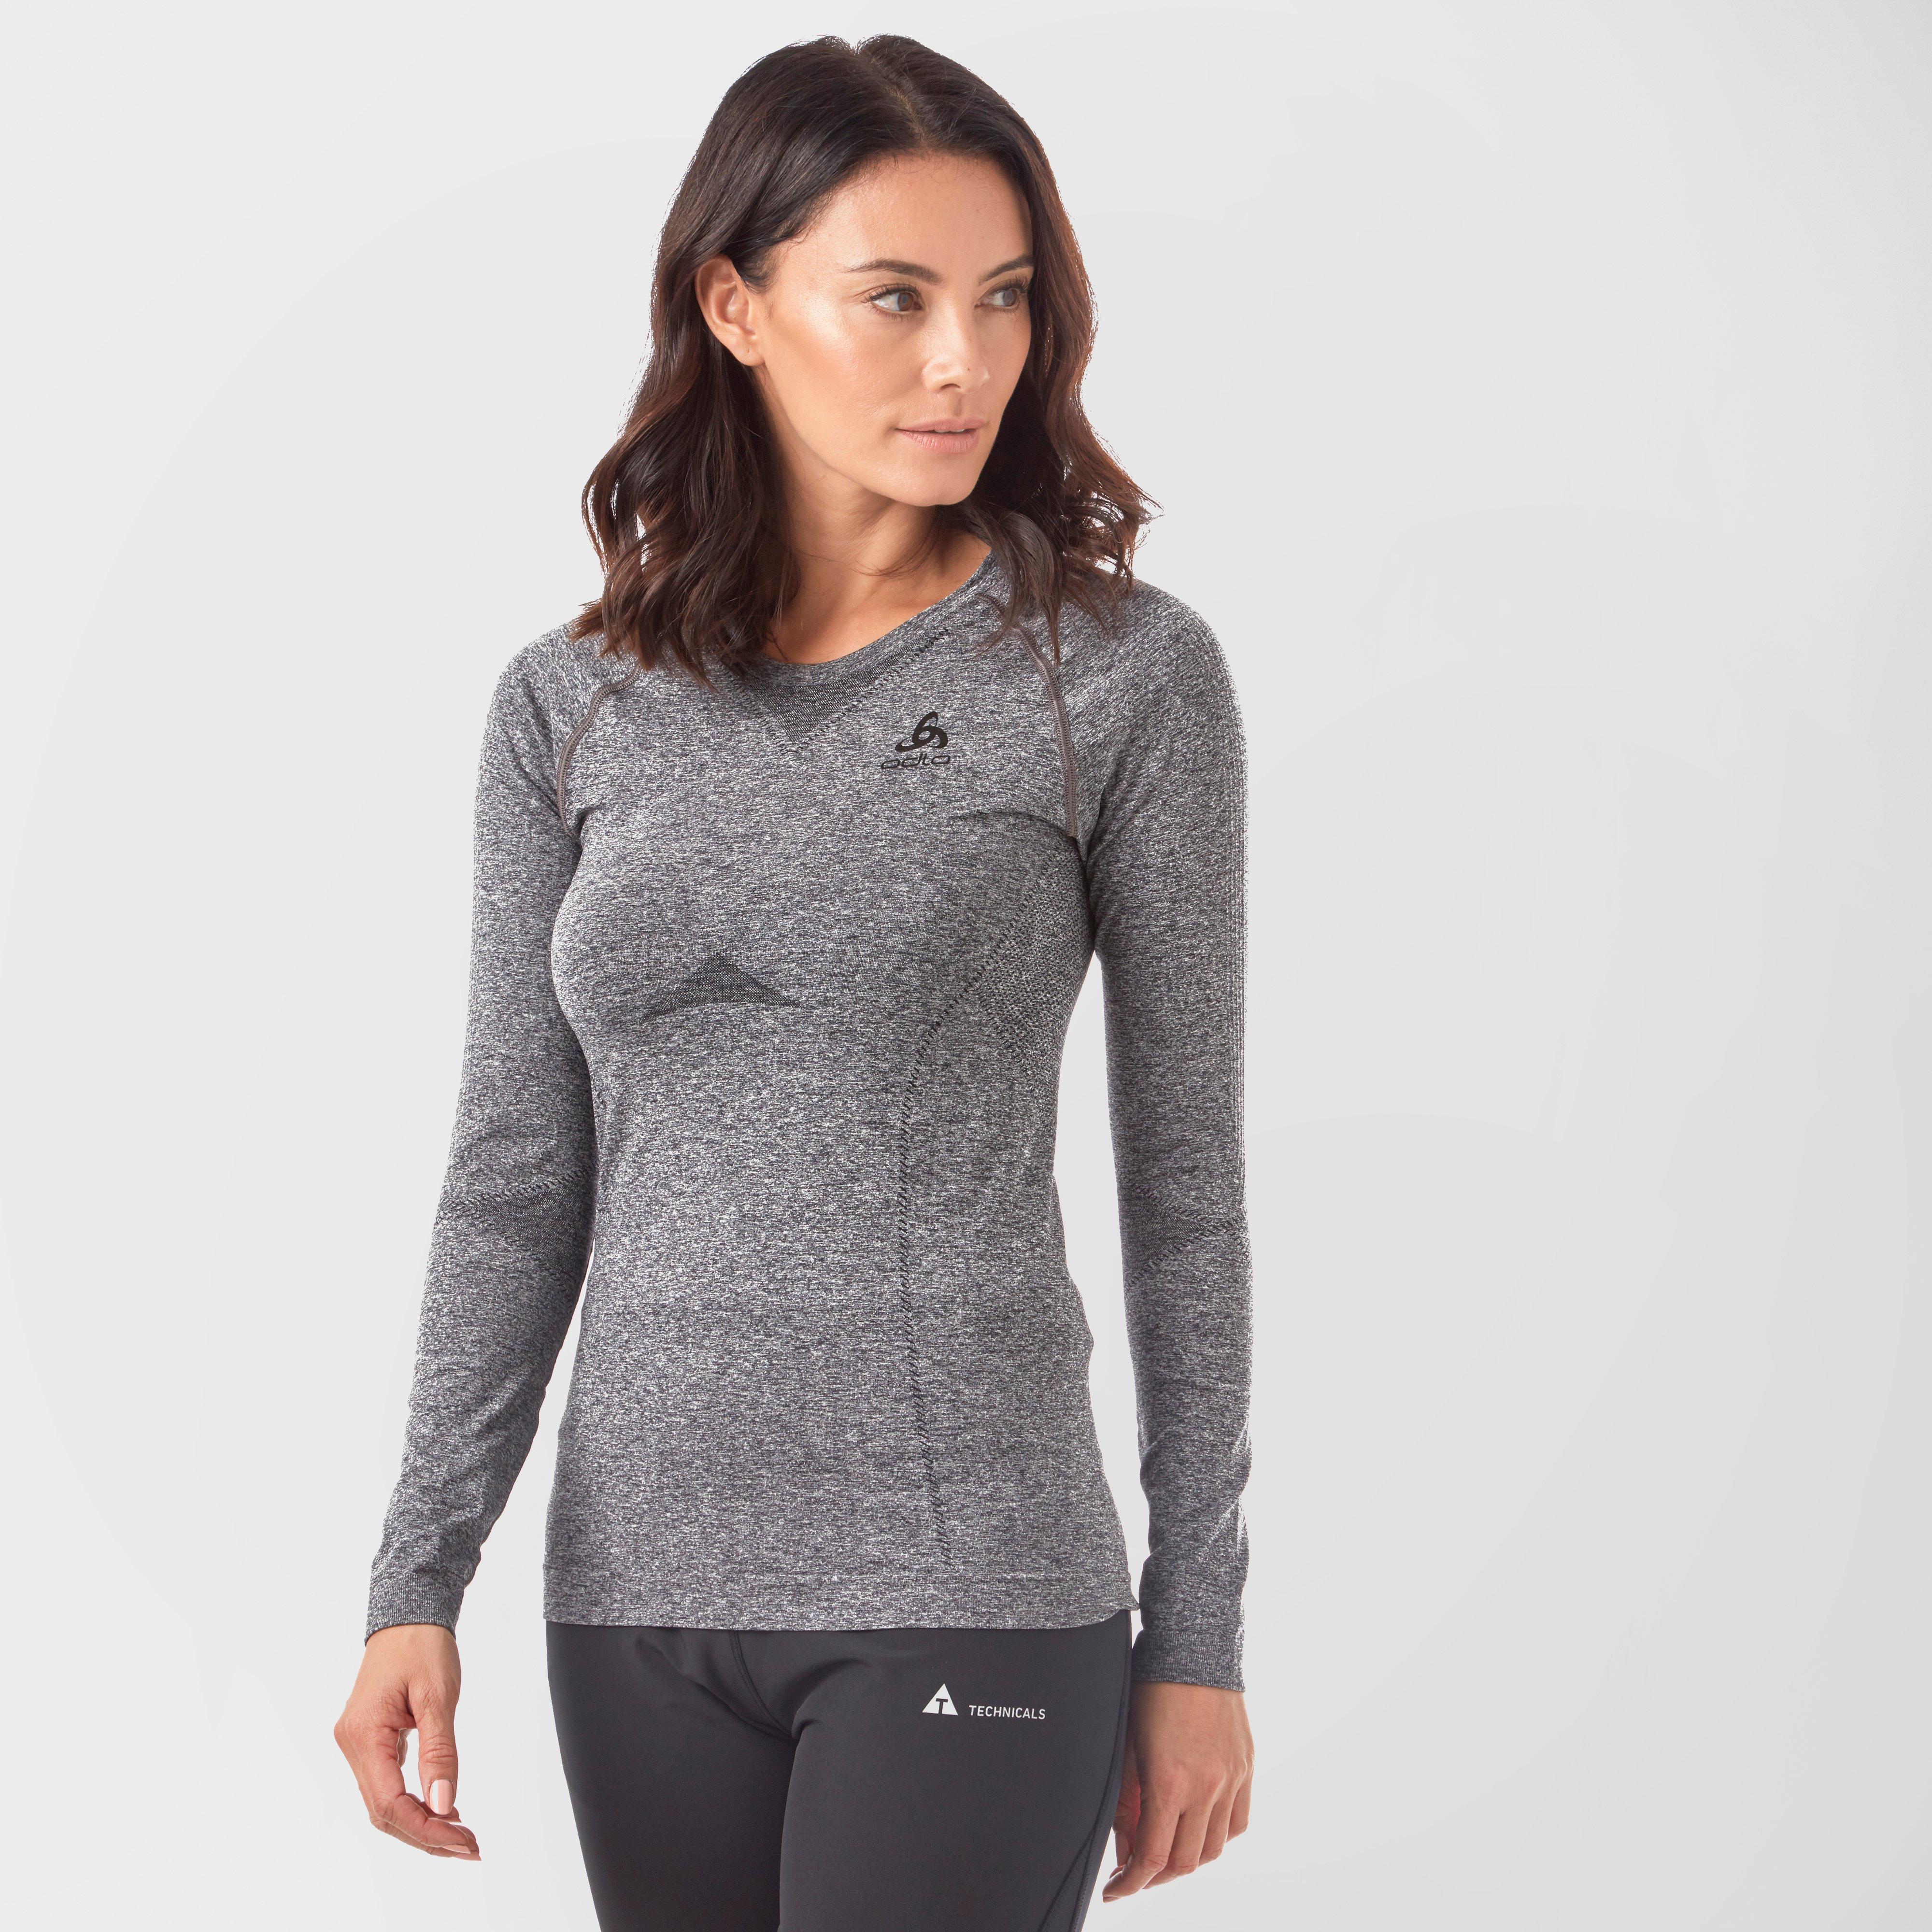 Odlo Women's SUW Performance Light Long Sleeve Baselayer, Grey